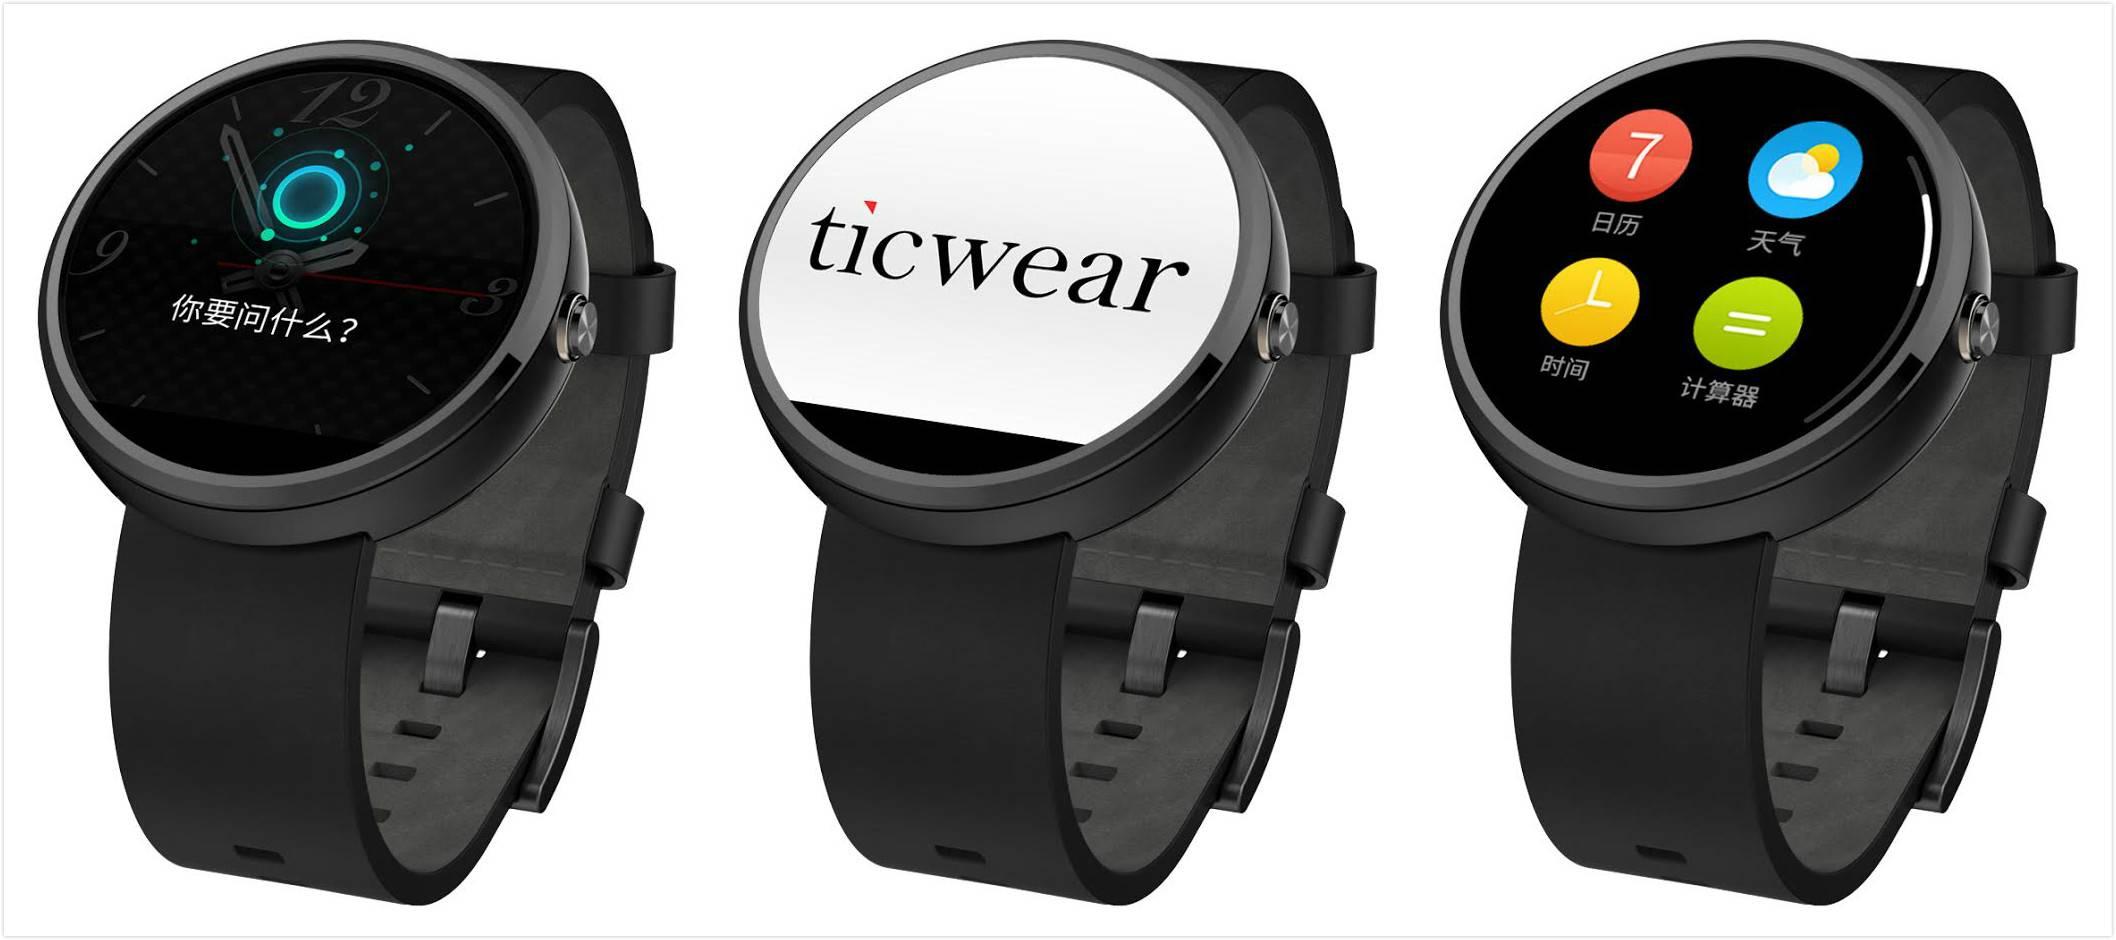 ticwear-showcase-image